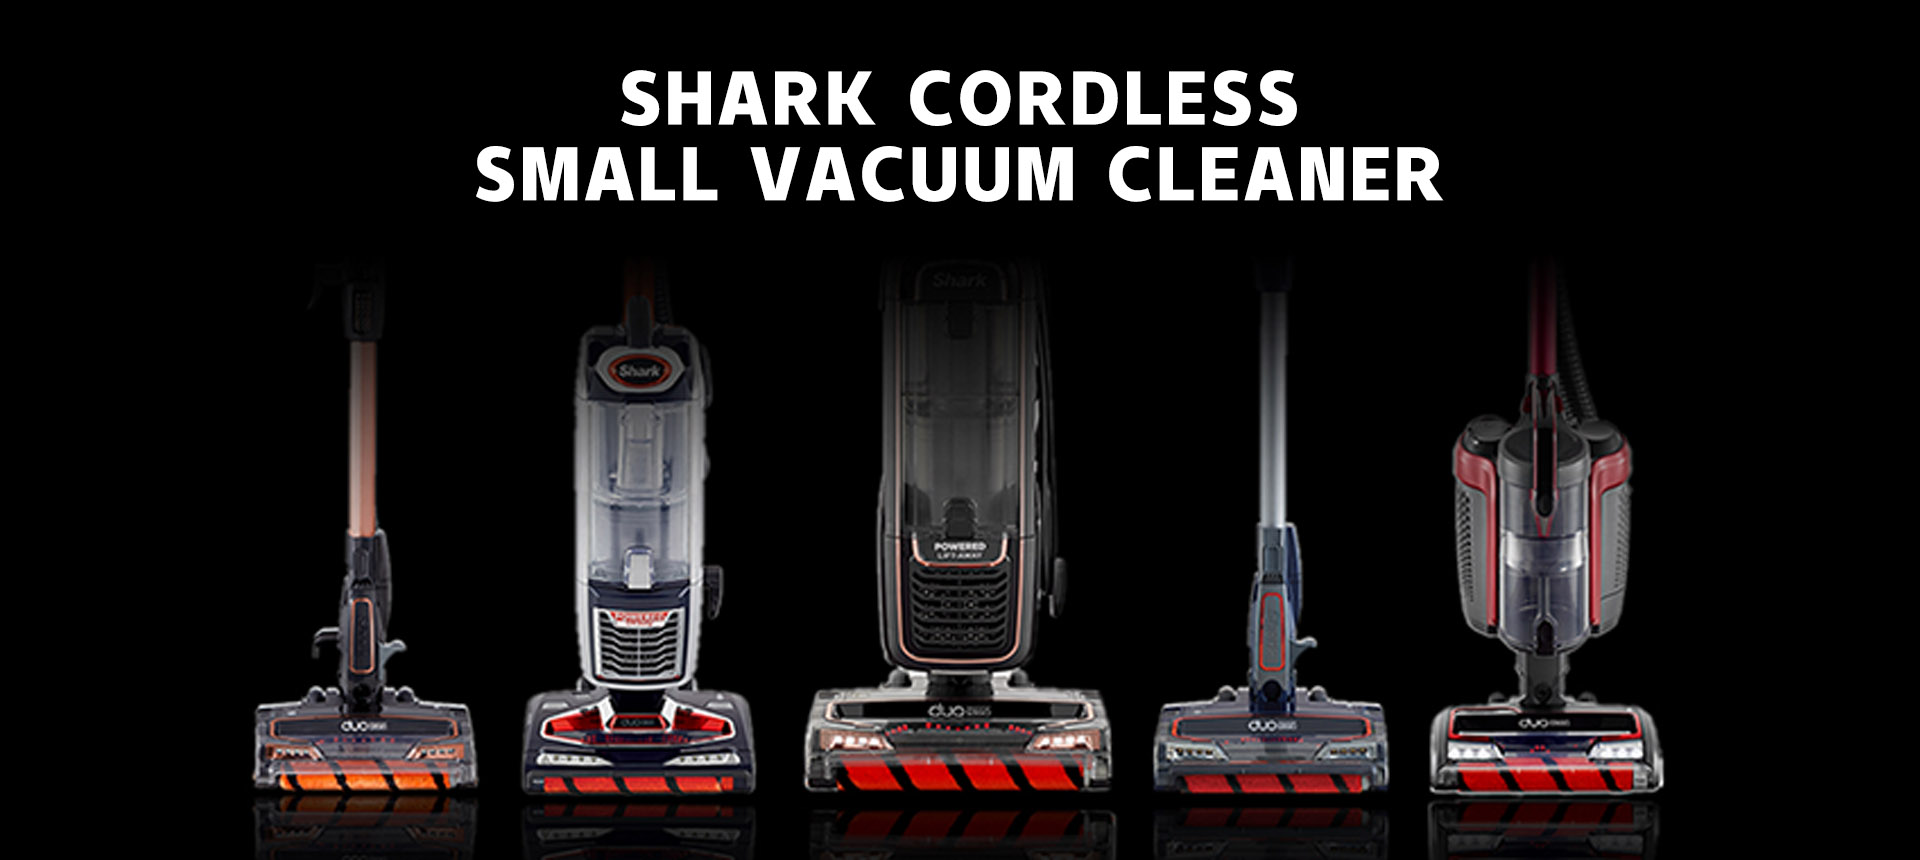 Shark Cordless Small Vacuum Cleaner